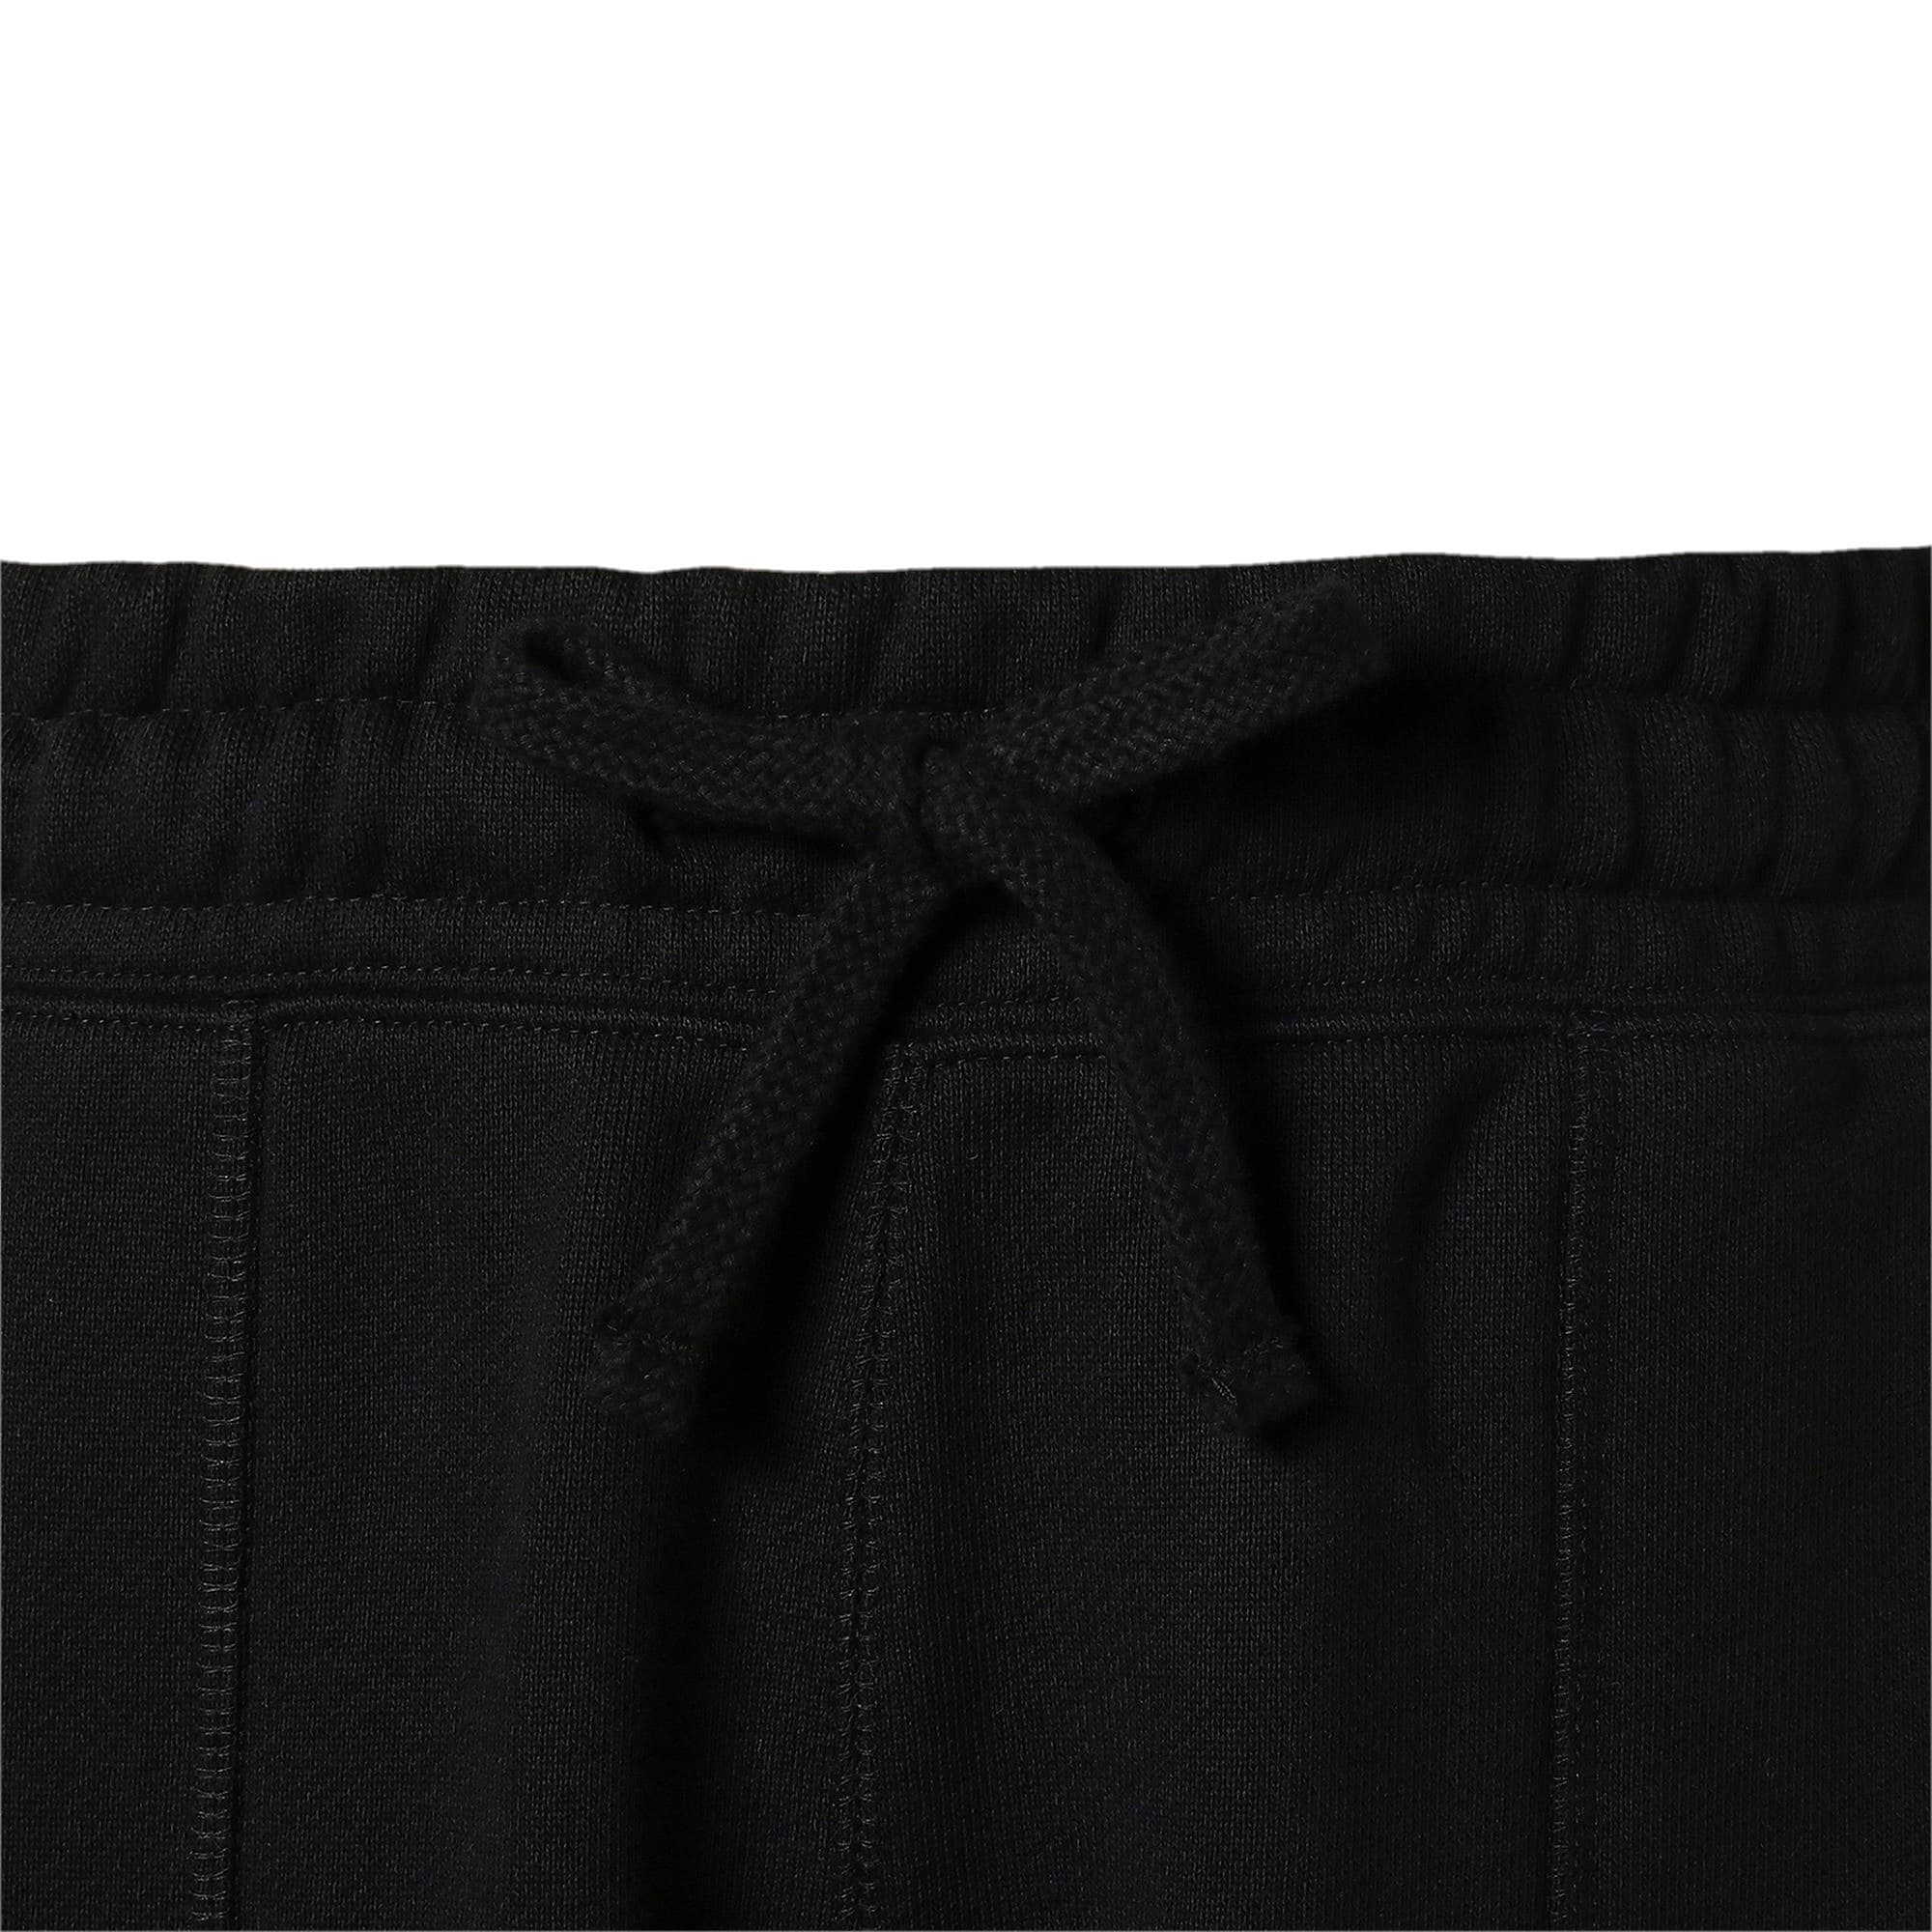 Thumbnail 7 of HEAVY CLASSICS パンツ, Cotton Black, medium-JPN